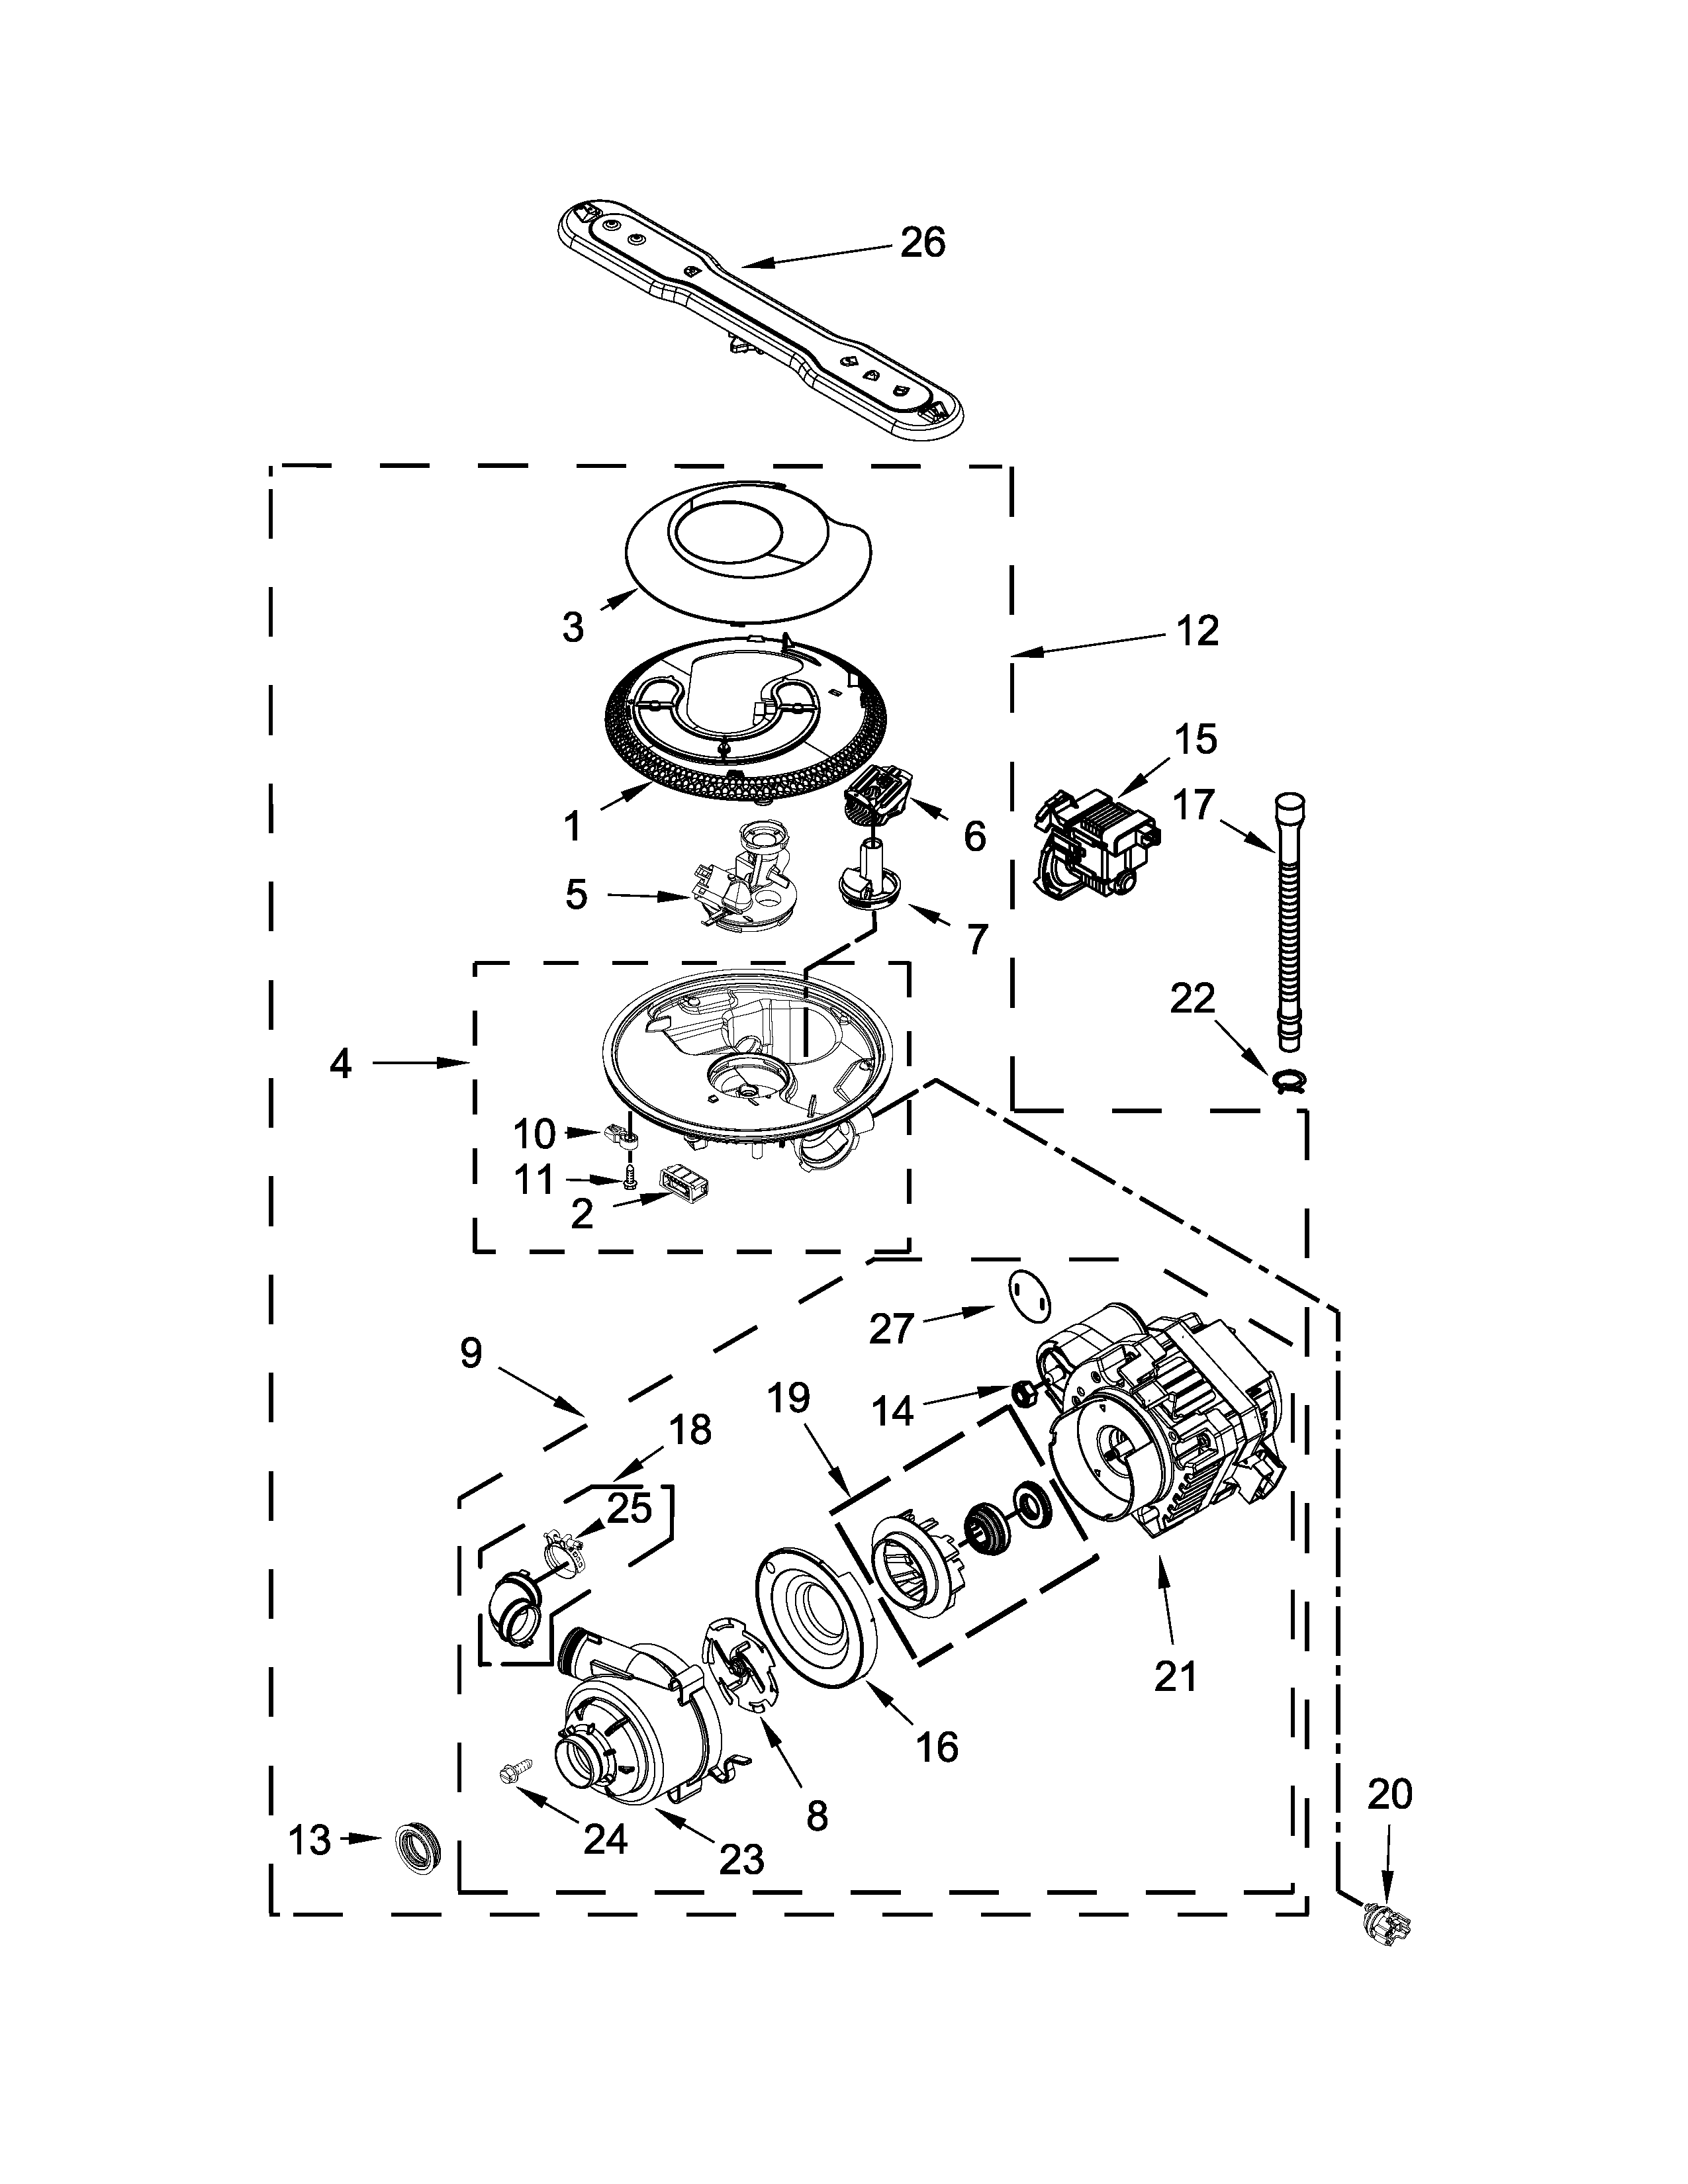 image result for diagrams for maytag dishwasher mdb4949sdm2 manual [ 2550 x 3300 Pixel ]